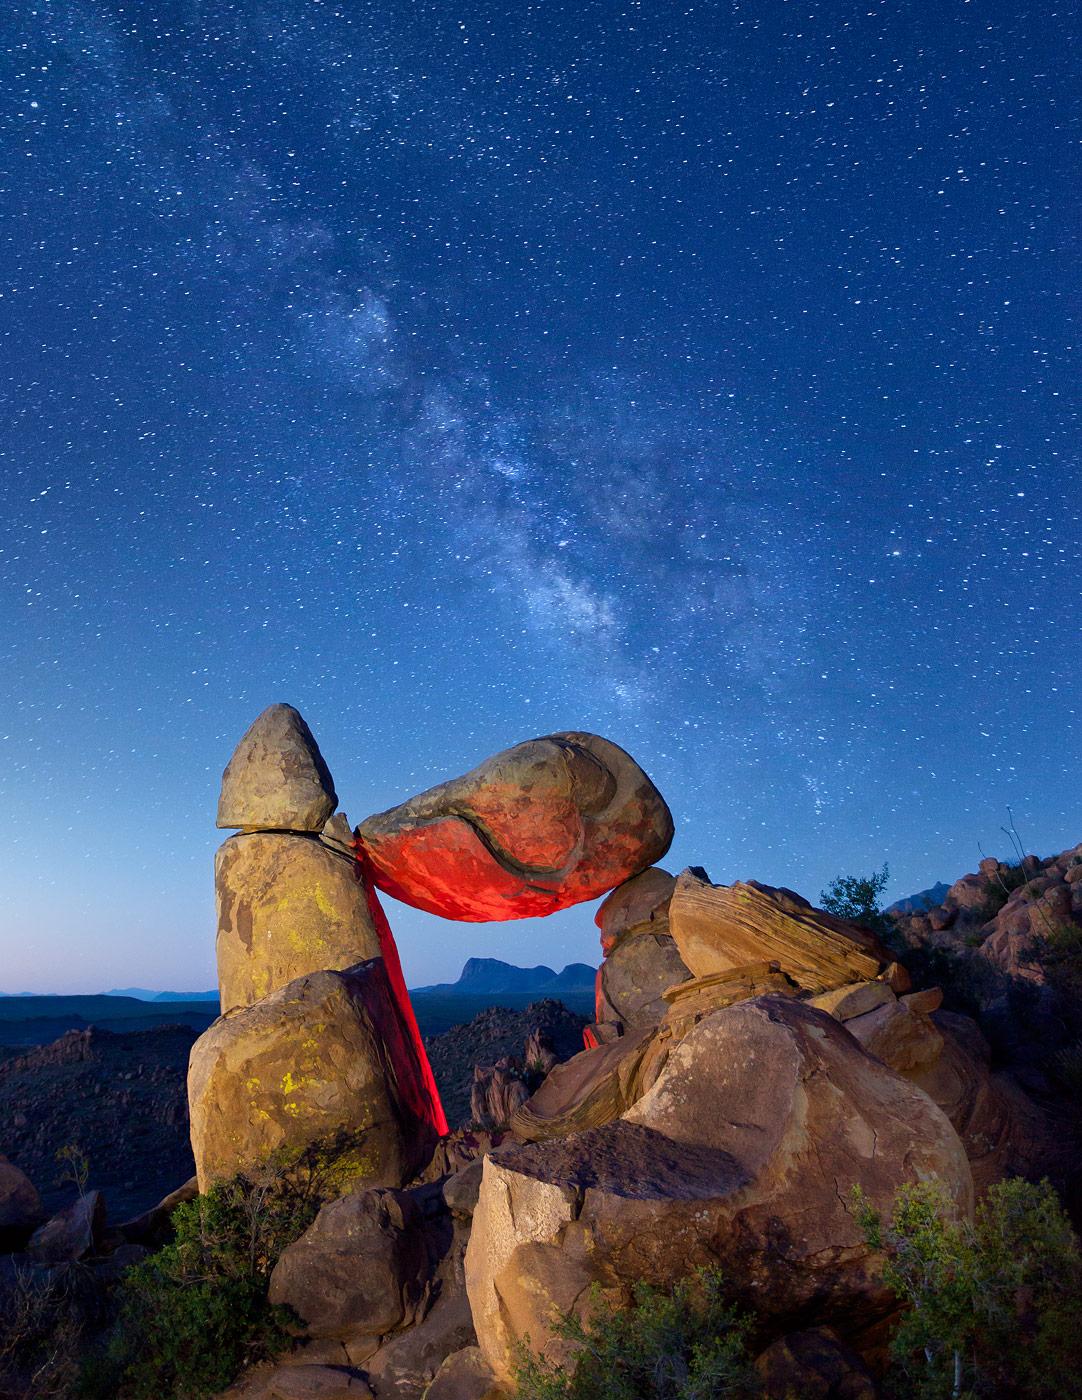 Big-Bend-National-Park-ABP-Balanced-Rock_Milky-Way.jpg